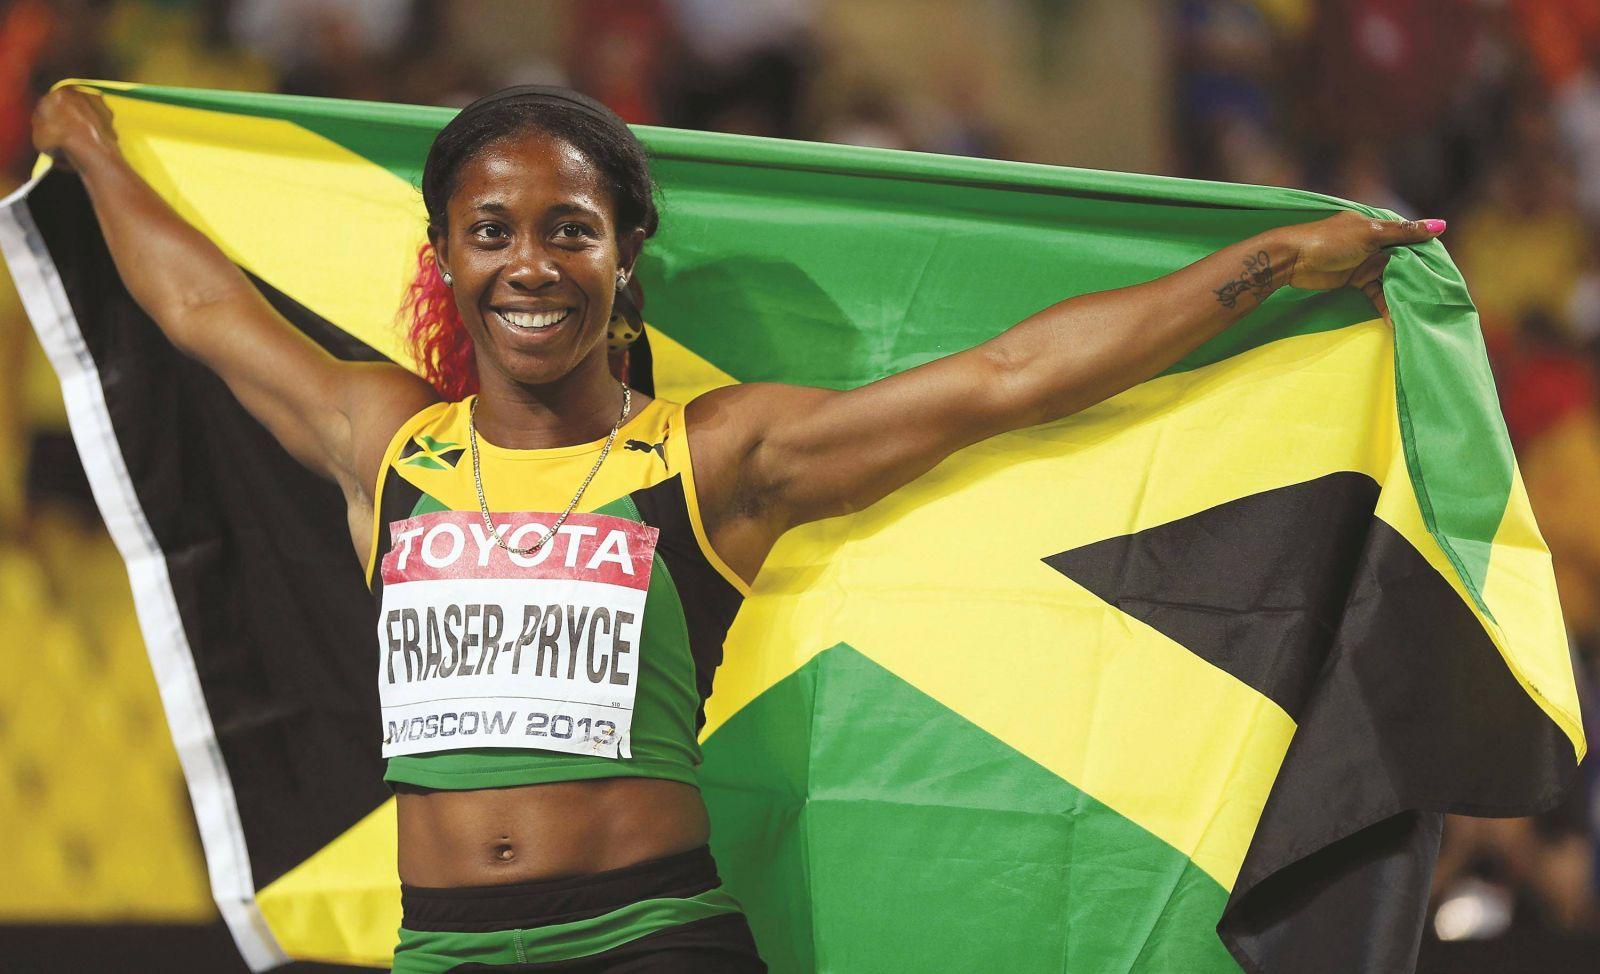 Shelly-Ann Fraser, estrela feminina do supertime de atletas velocistas da Jamaica